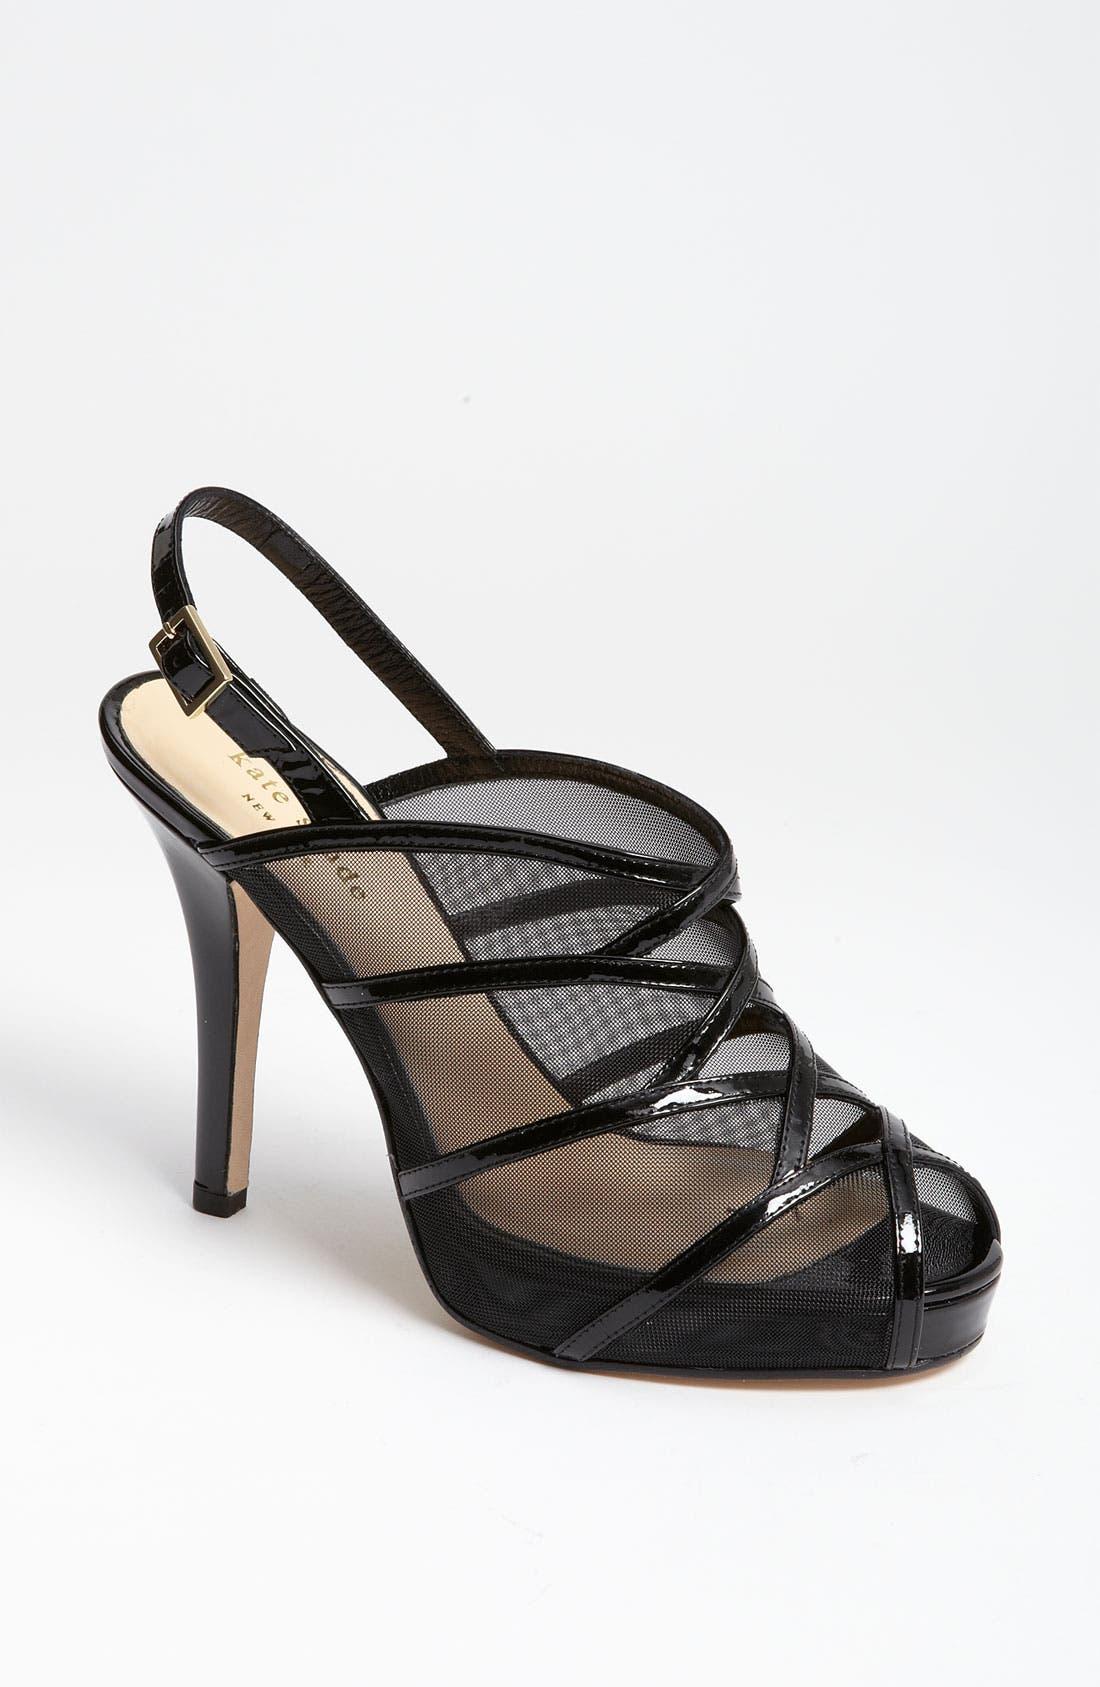 Main Image - kate spade new york 'rachael' sandal